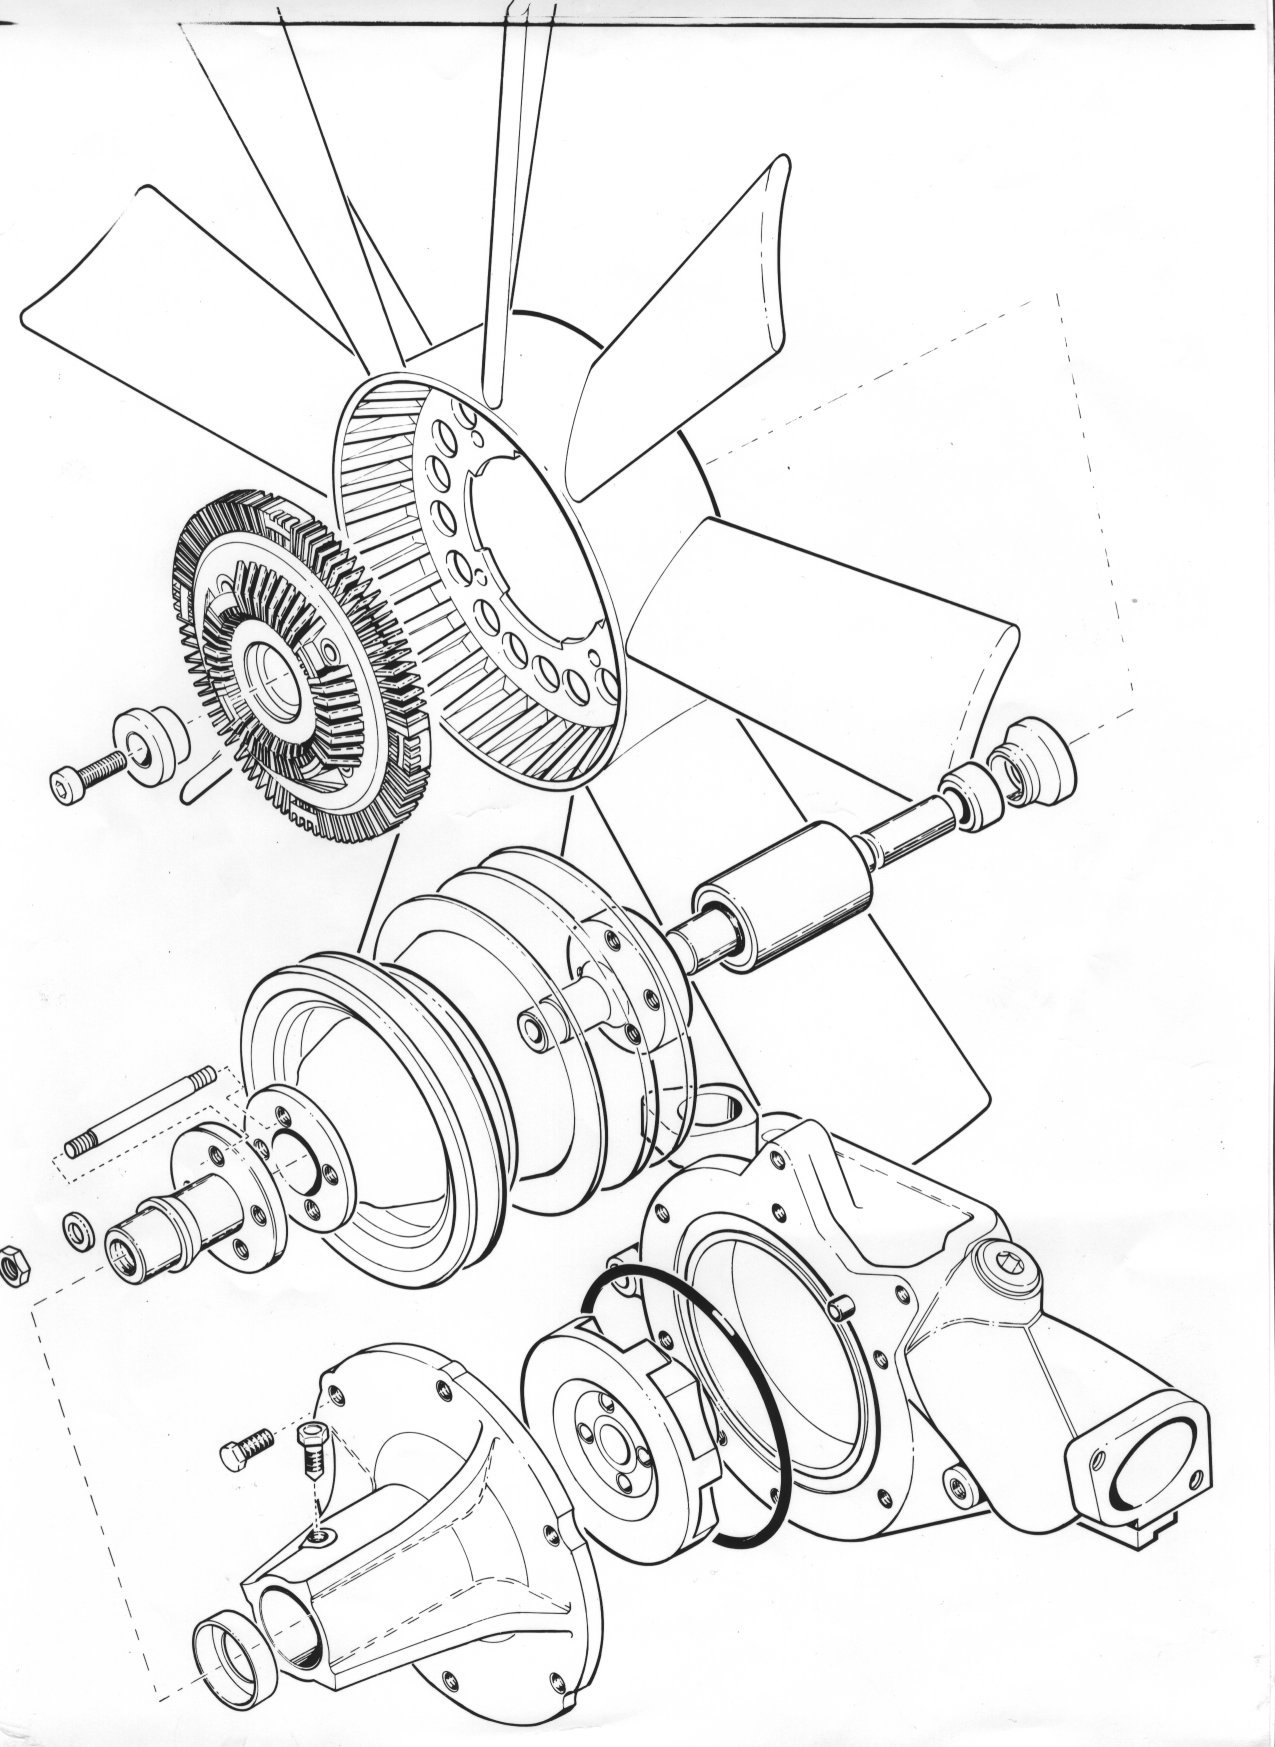 Impress Visuals Technical Illustration